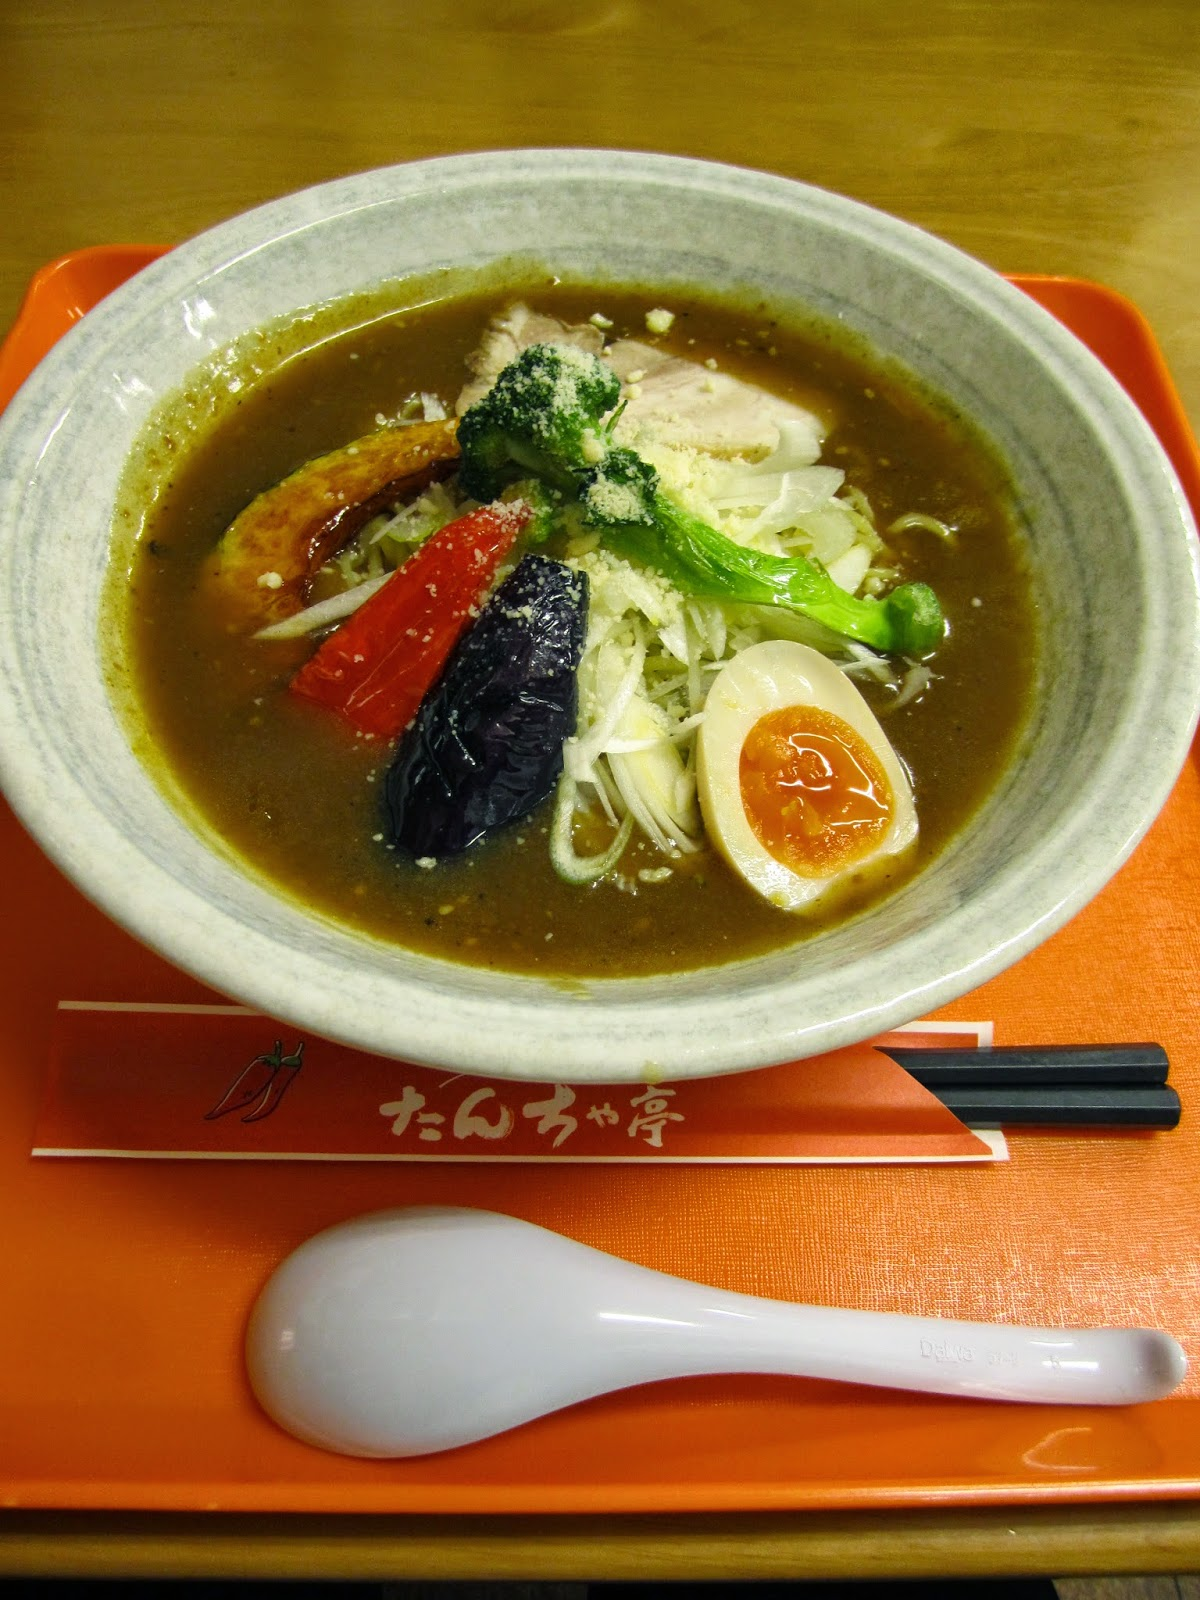 Curry Noodles Tanchatei Towada カレーヌードル たんちゃ亭 十和田市